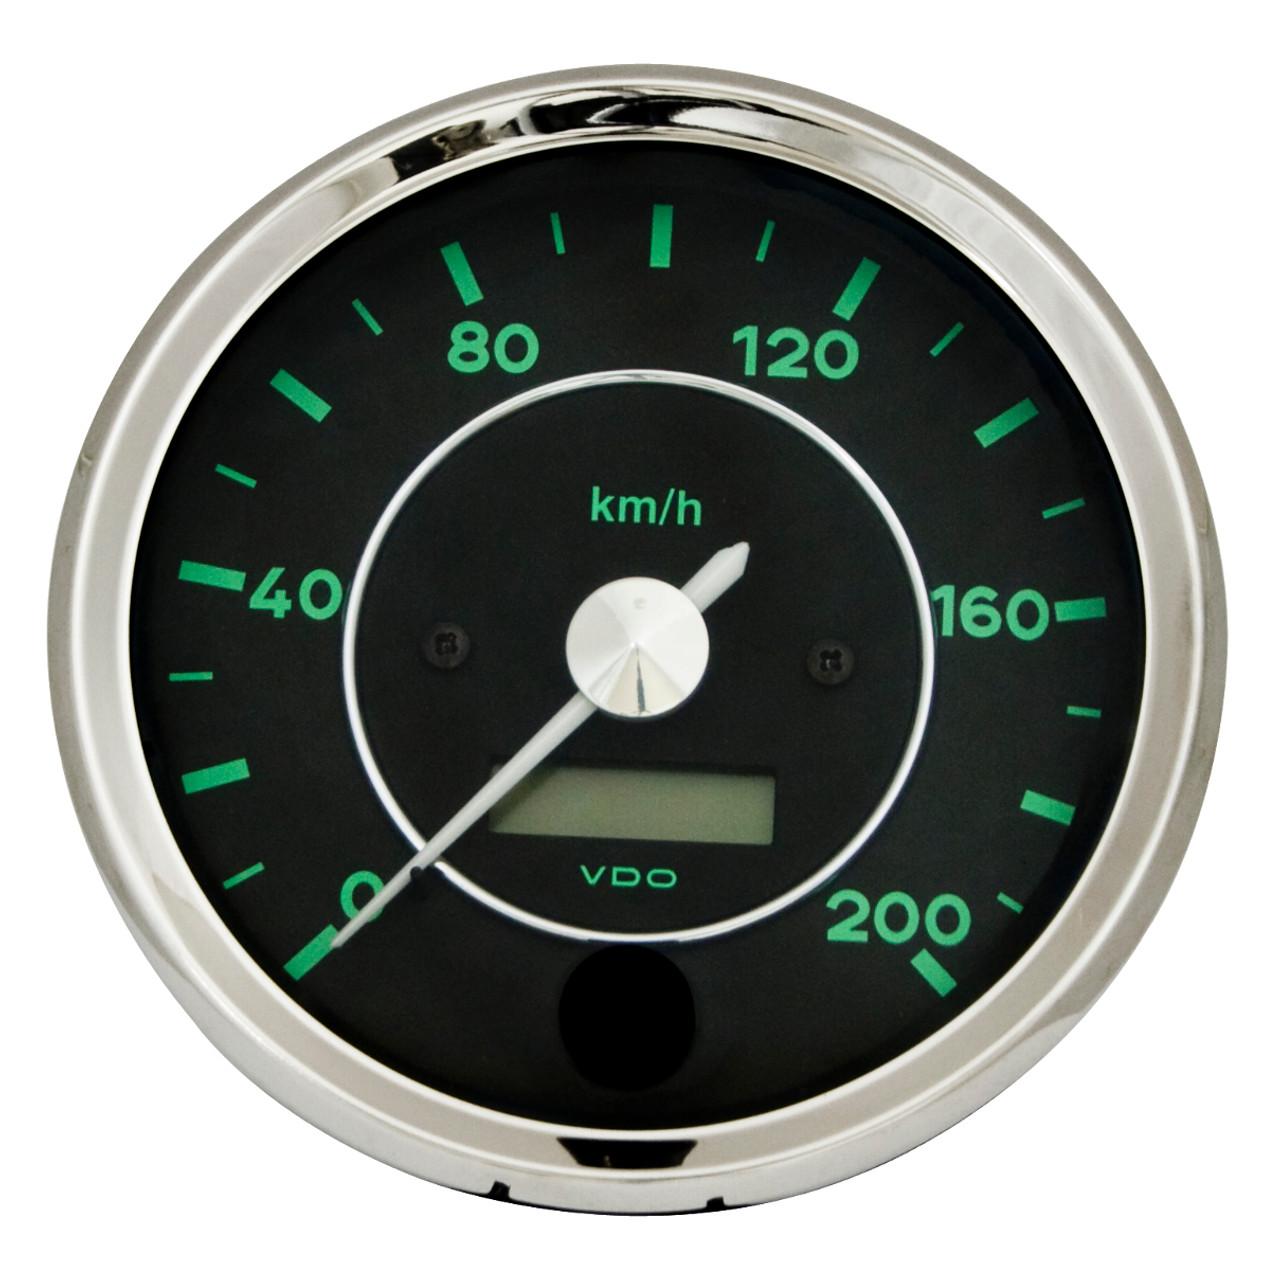 "VDO ""356"" Series 200KM Speed Gauge"